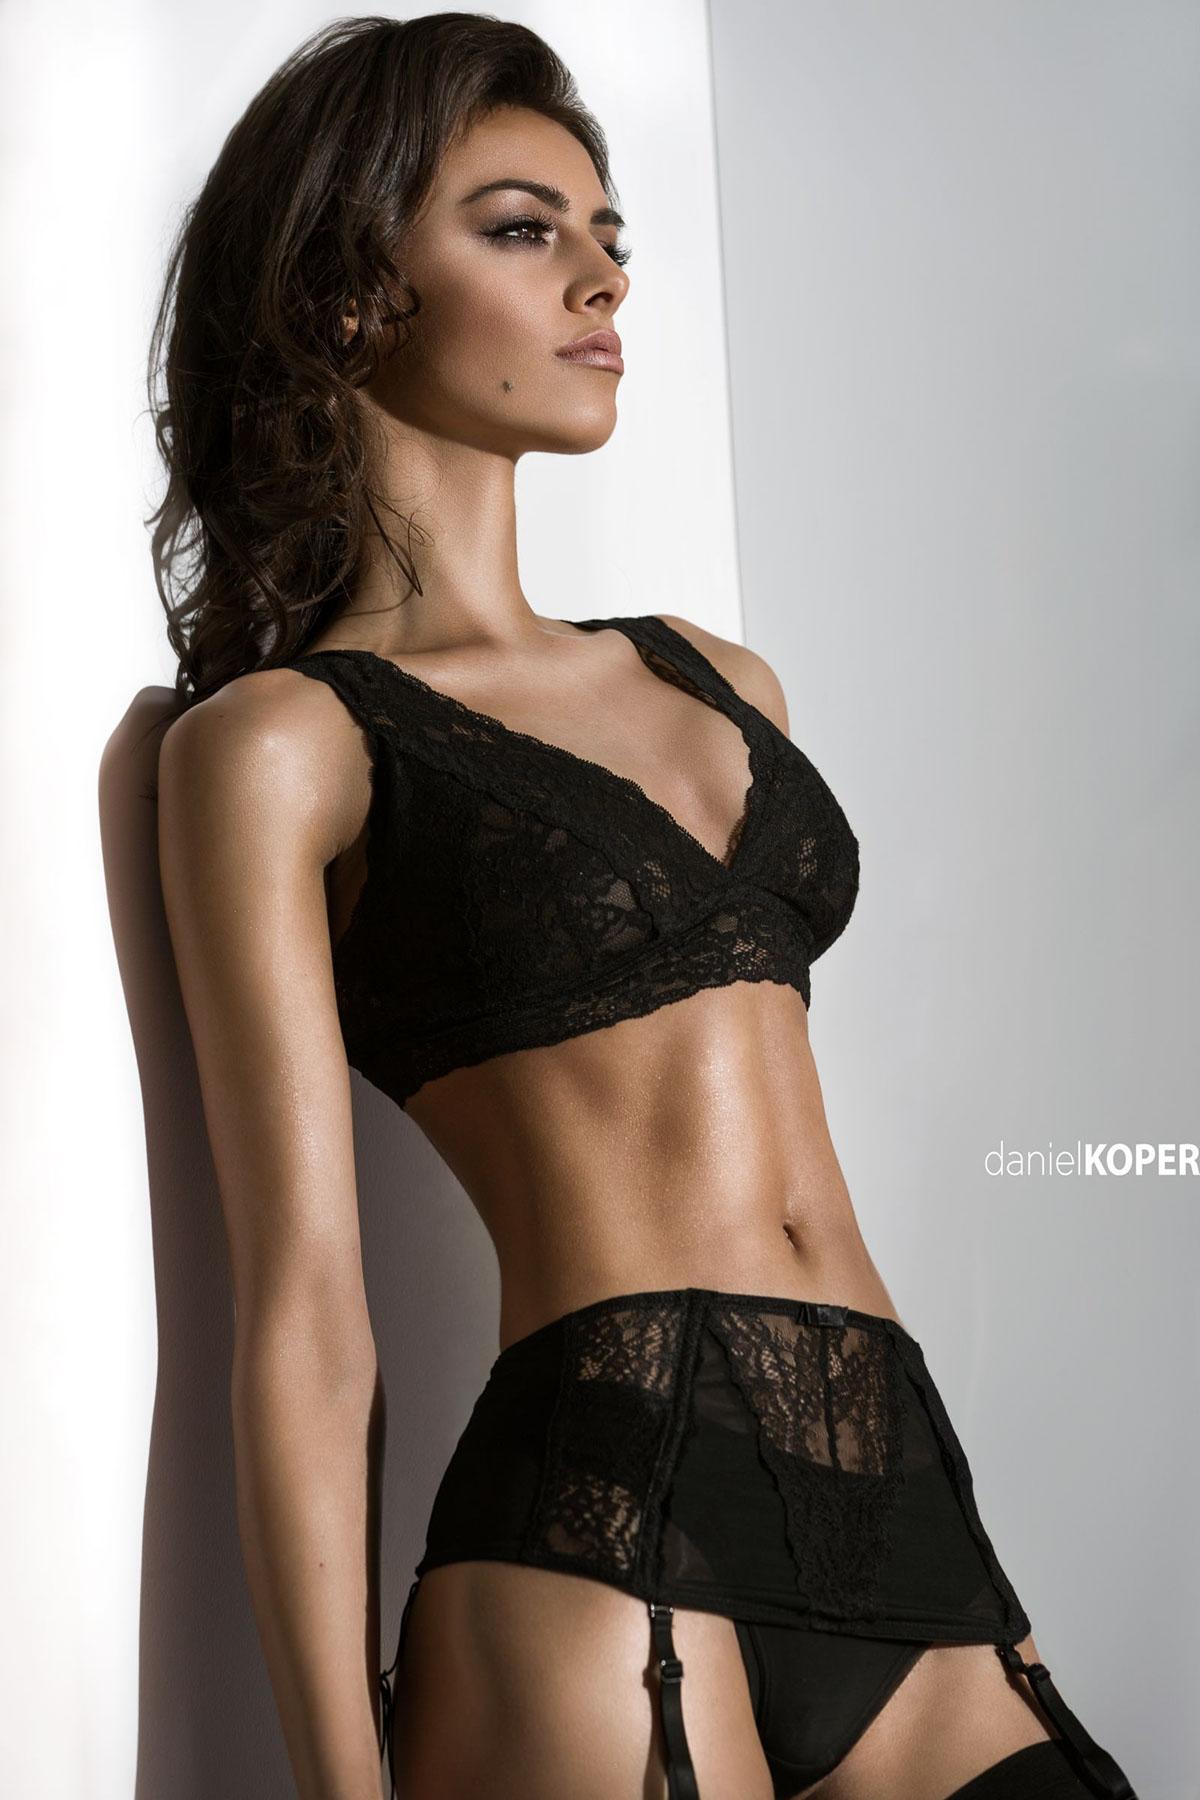 Bikini Anita Sikorska nudes (26 photo), Ass, Is a cute, Twitter, swimsuit 2020